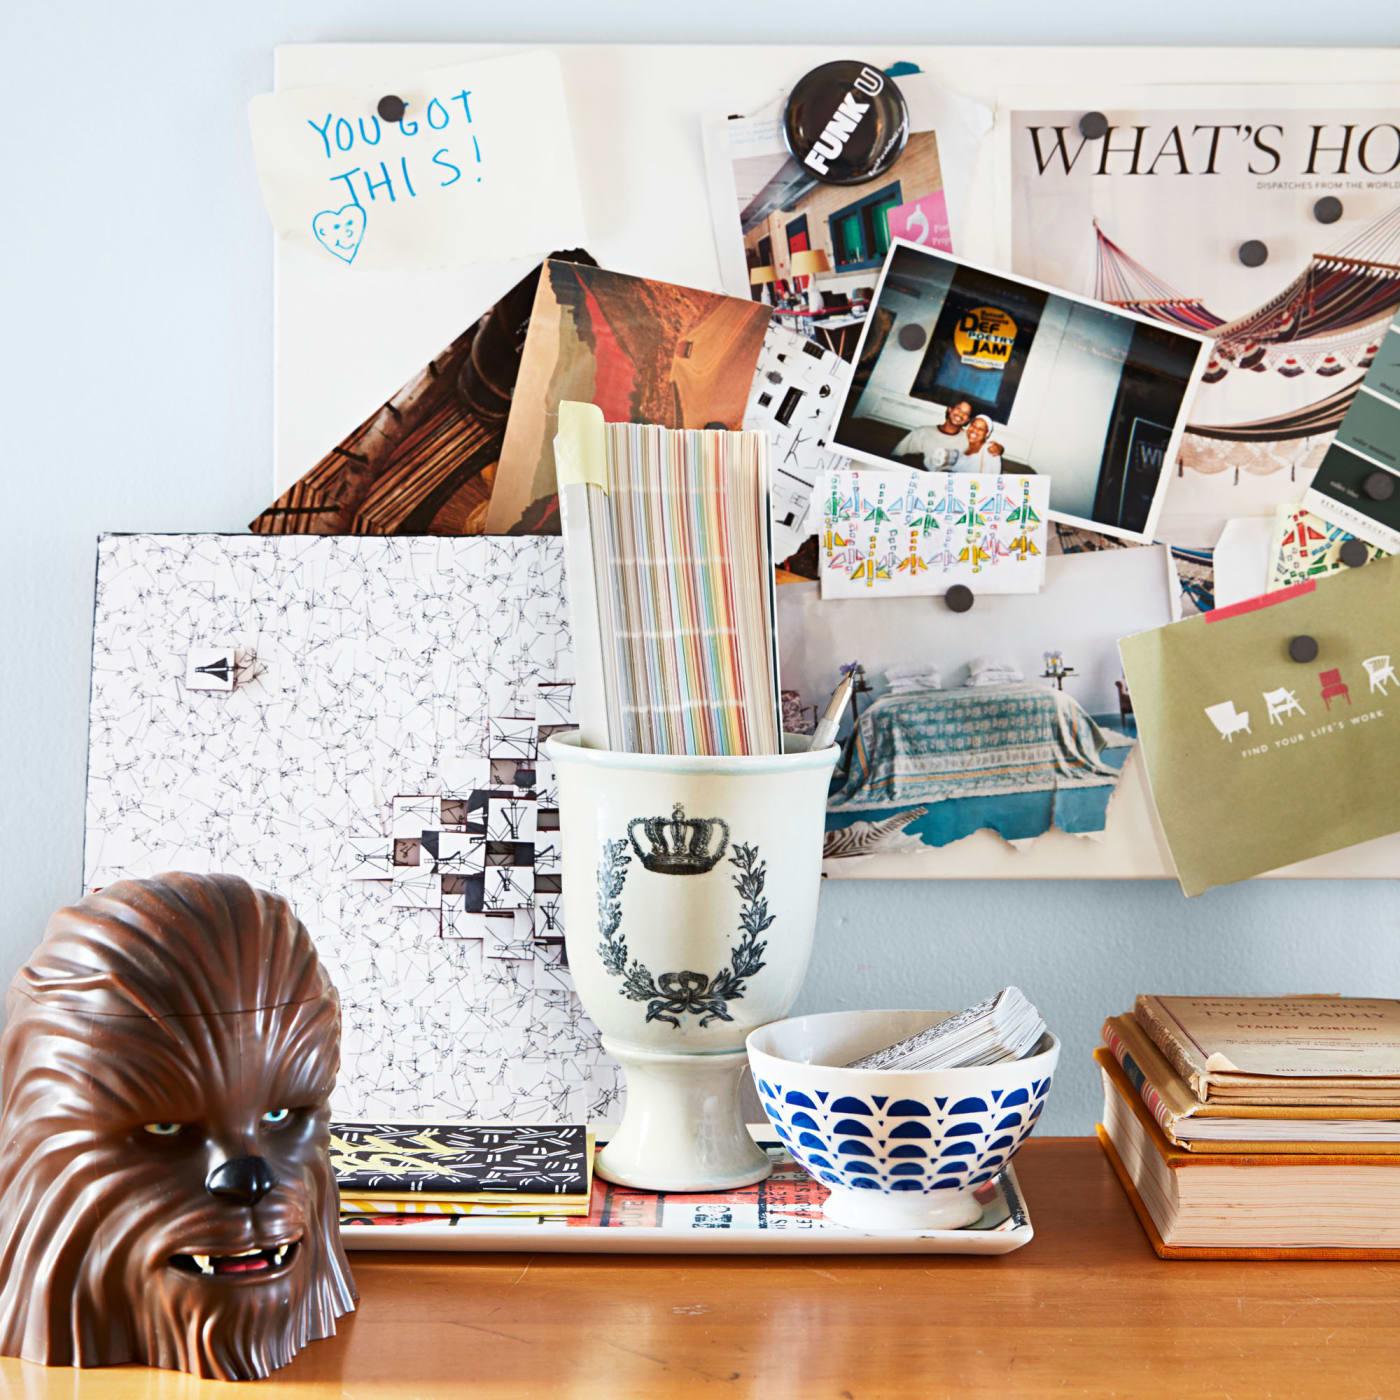 office-desk-with-photos-and-decor.jpg